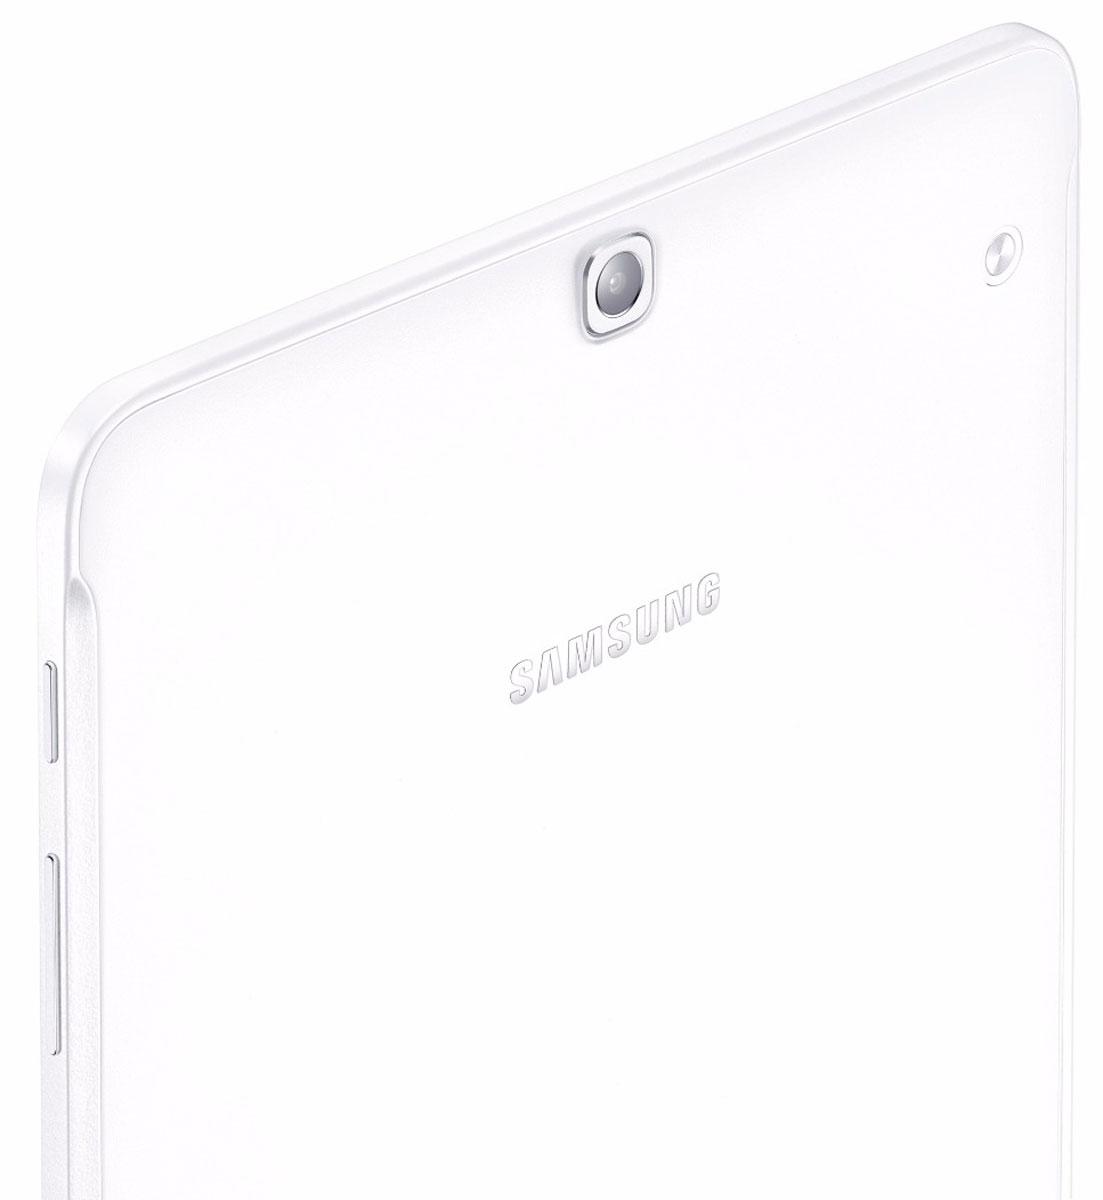 Samsung Galaxy Tab S2 9. 7 SM-T819, White Samsung